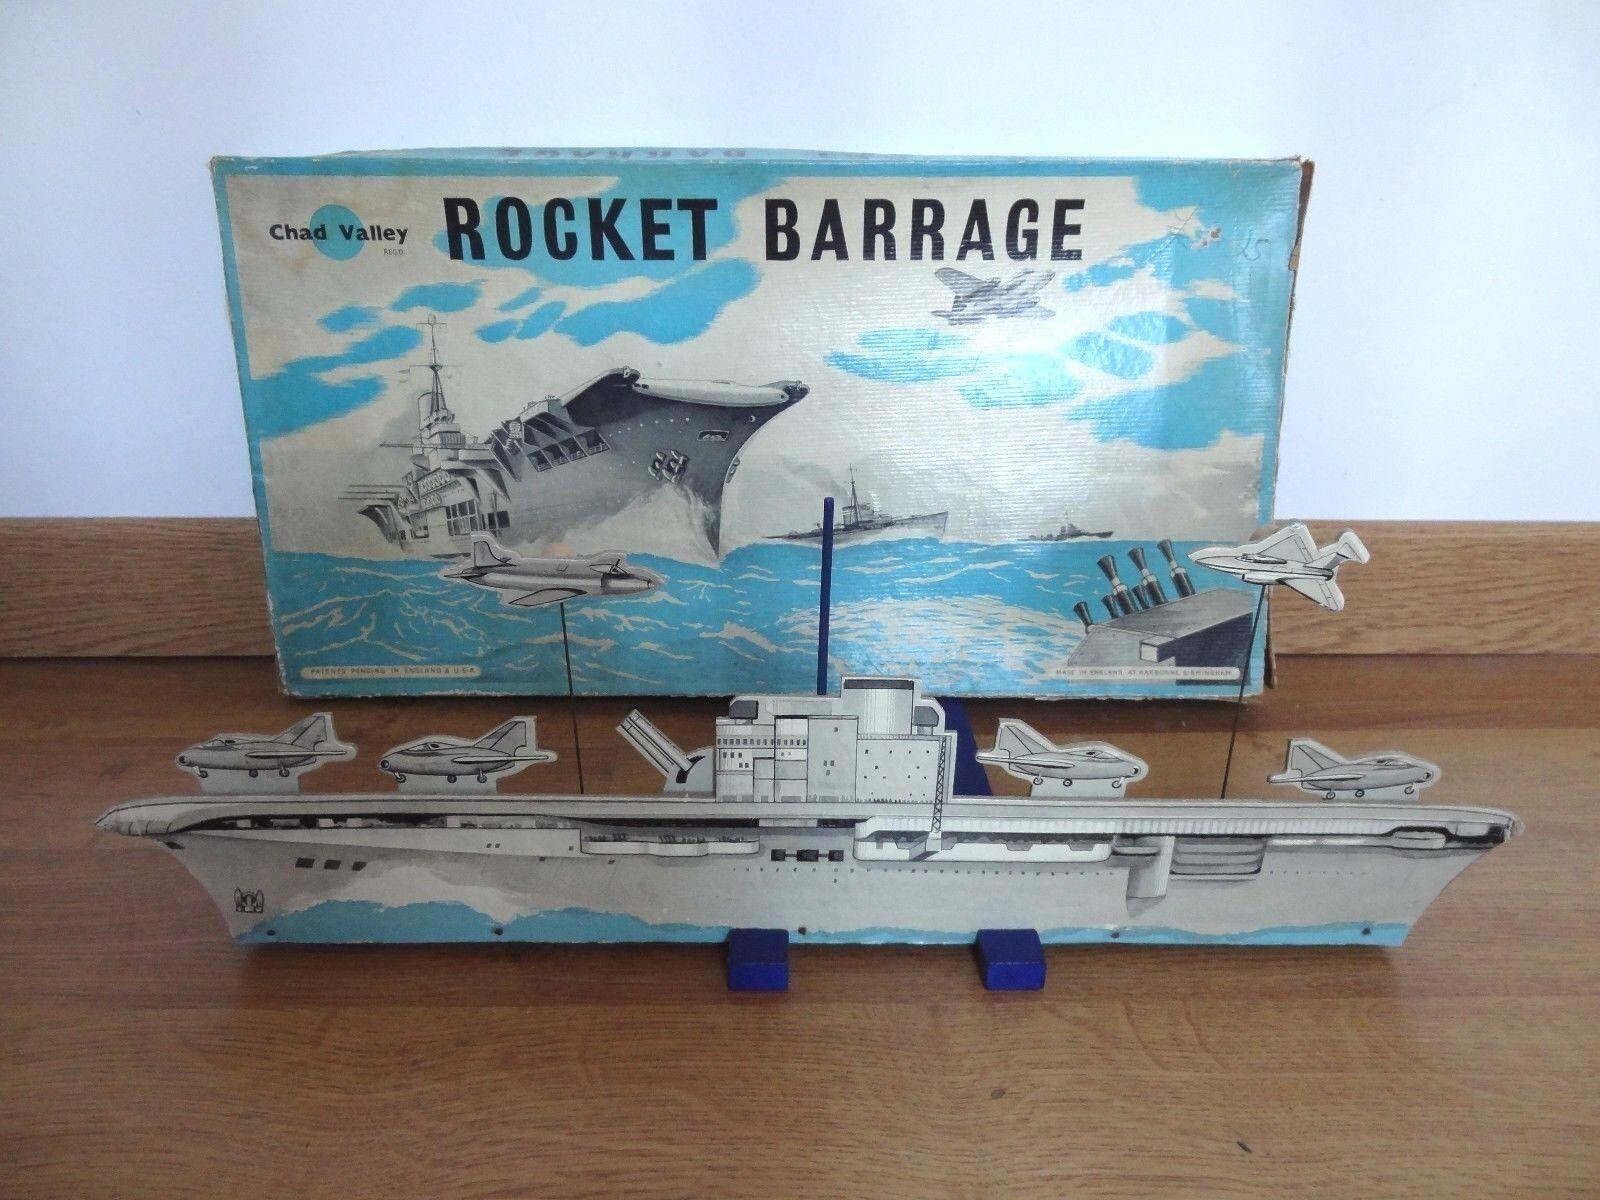 Ancien jouet jeu de tir navire porte avions bateau England chad valley 1950